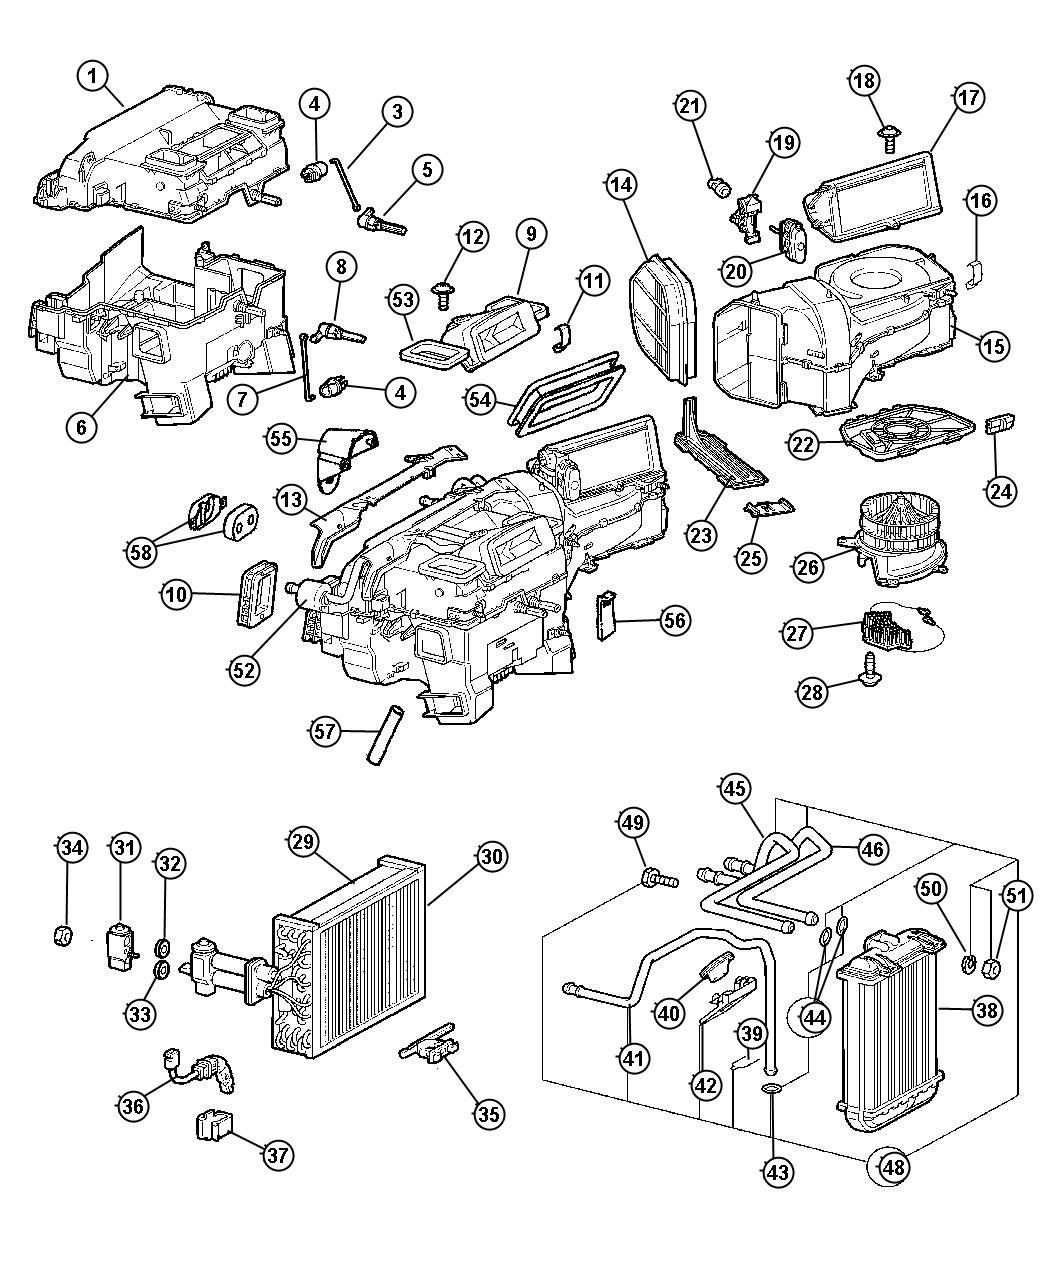 2000 mazda mpv engine diagram